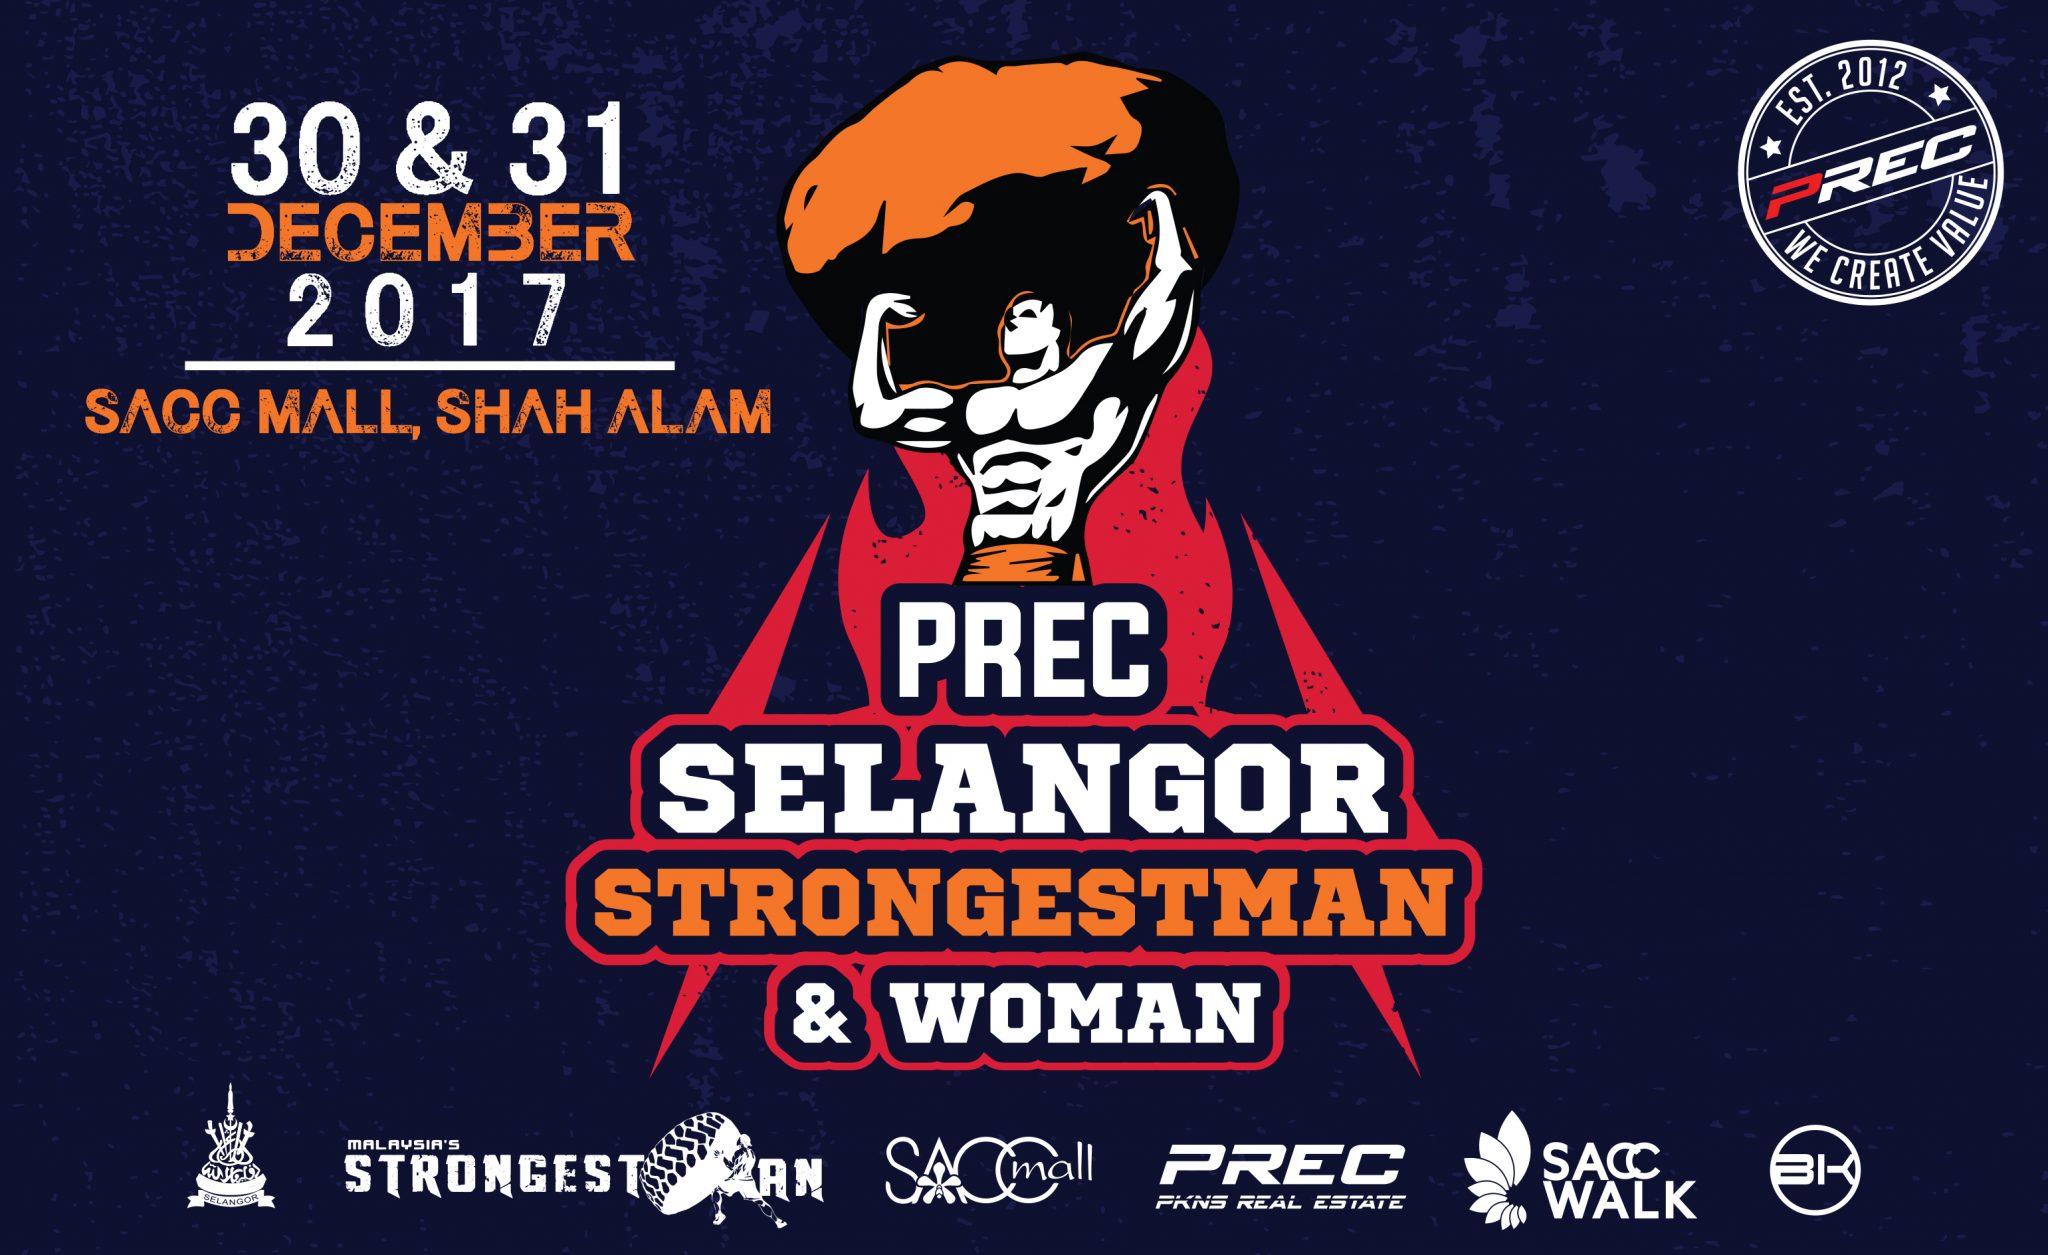 PRECs SELANGOR STRONGEST MAN & WOMAN 2017 di SACC MALL